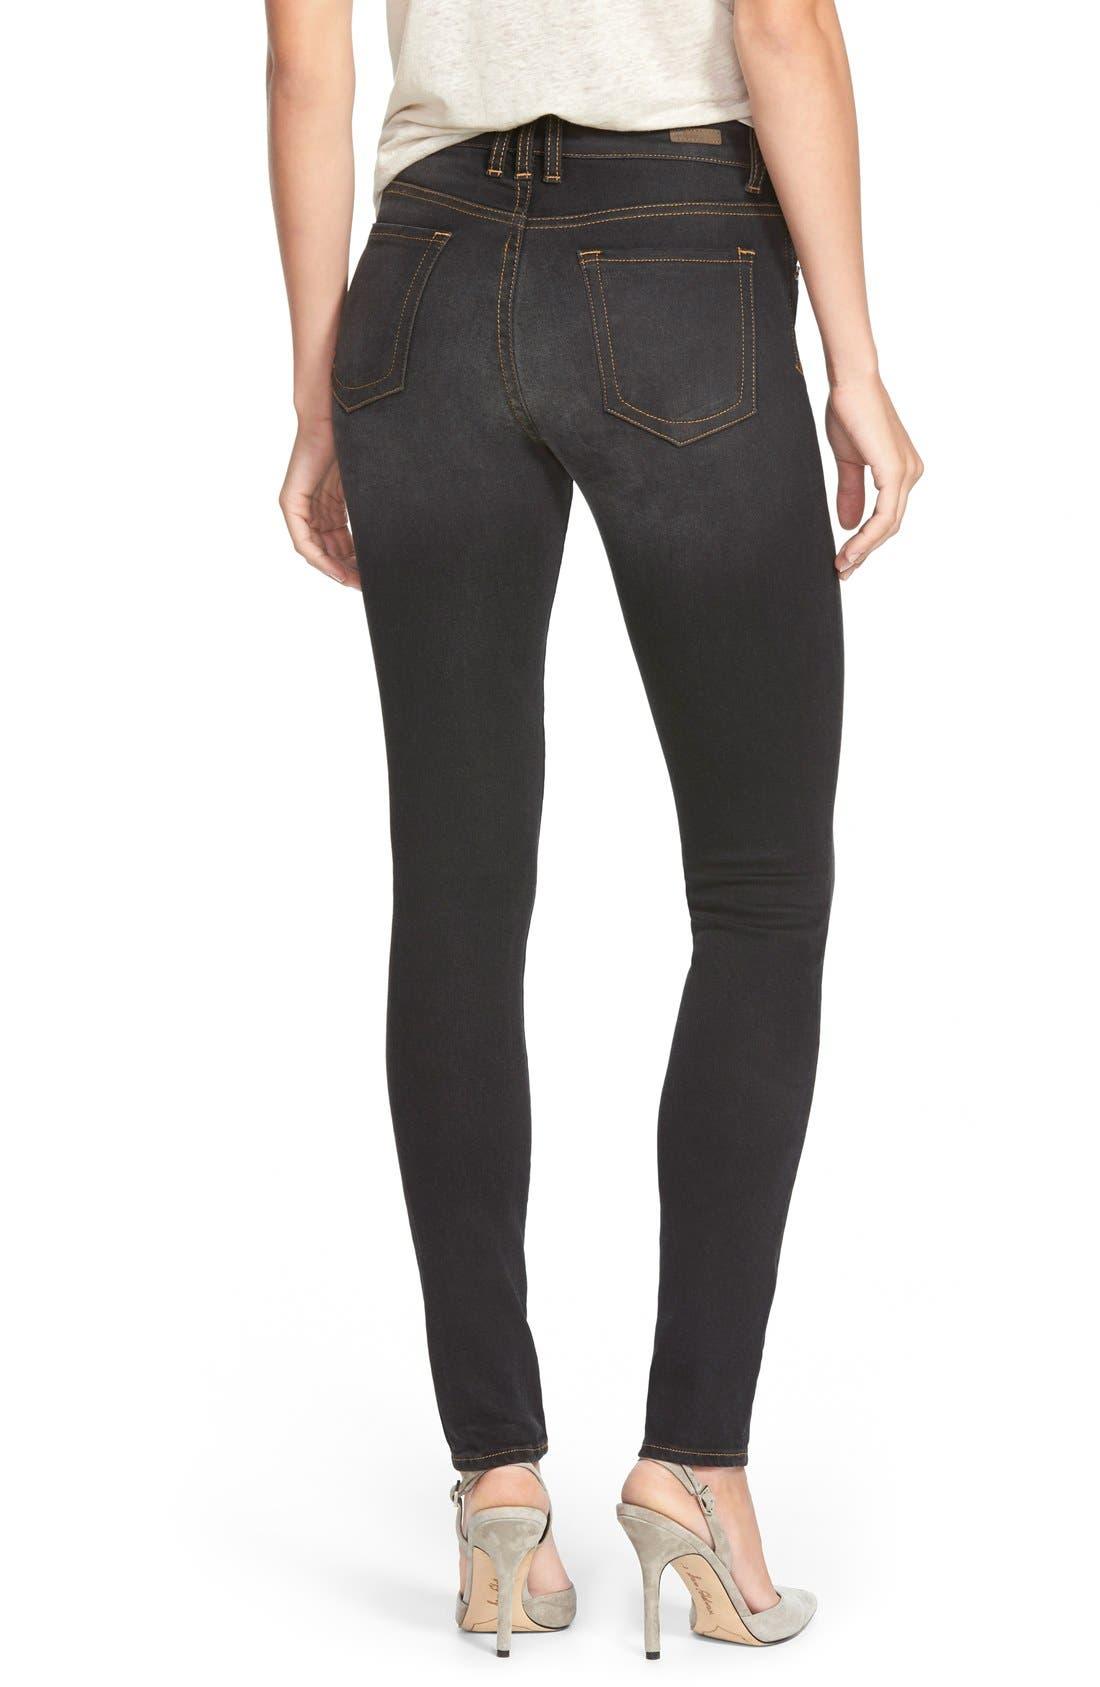 Alternate Image 2  - KUT from the Kloth 'Diana' Stretch Skinny Jeans (Black) (Regular & Petite)